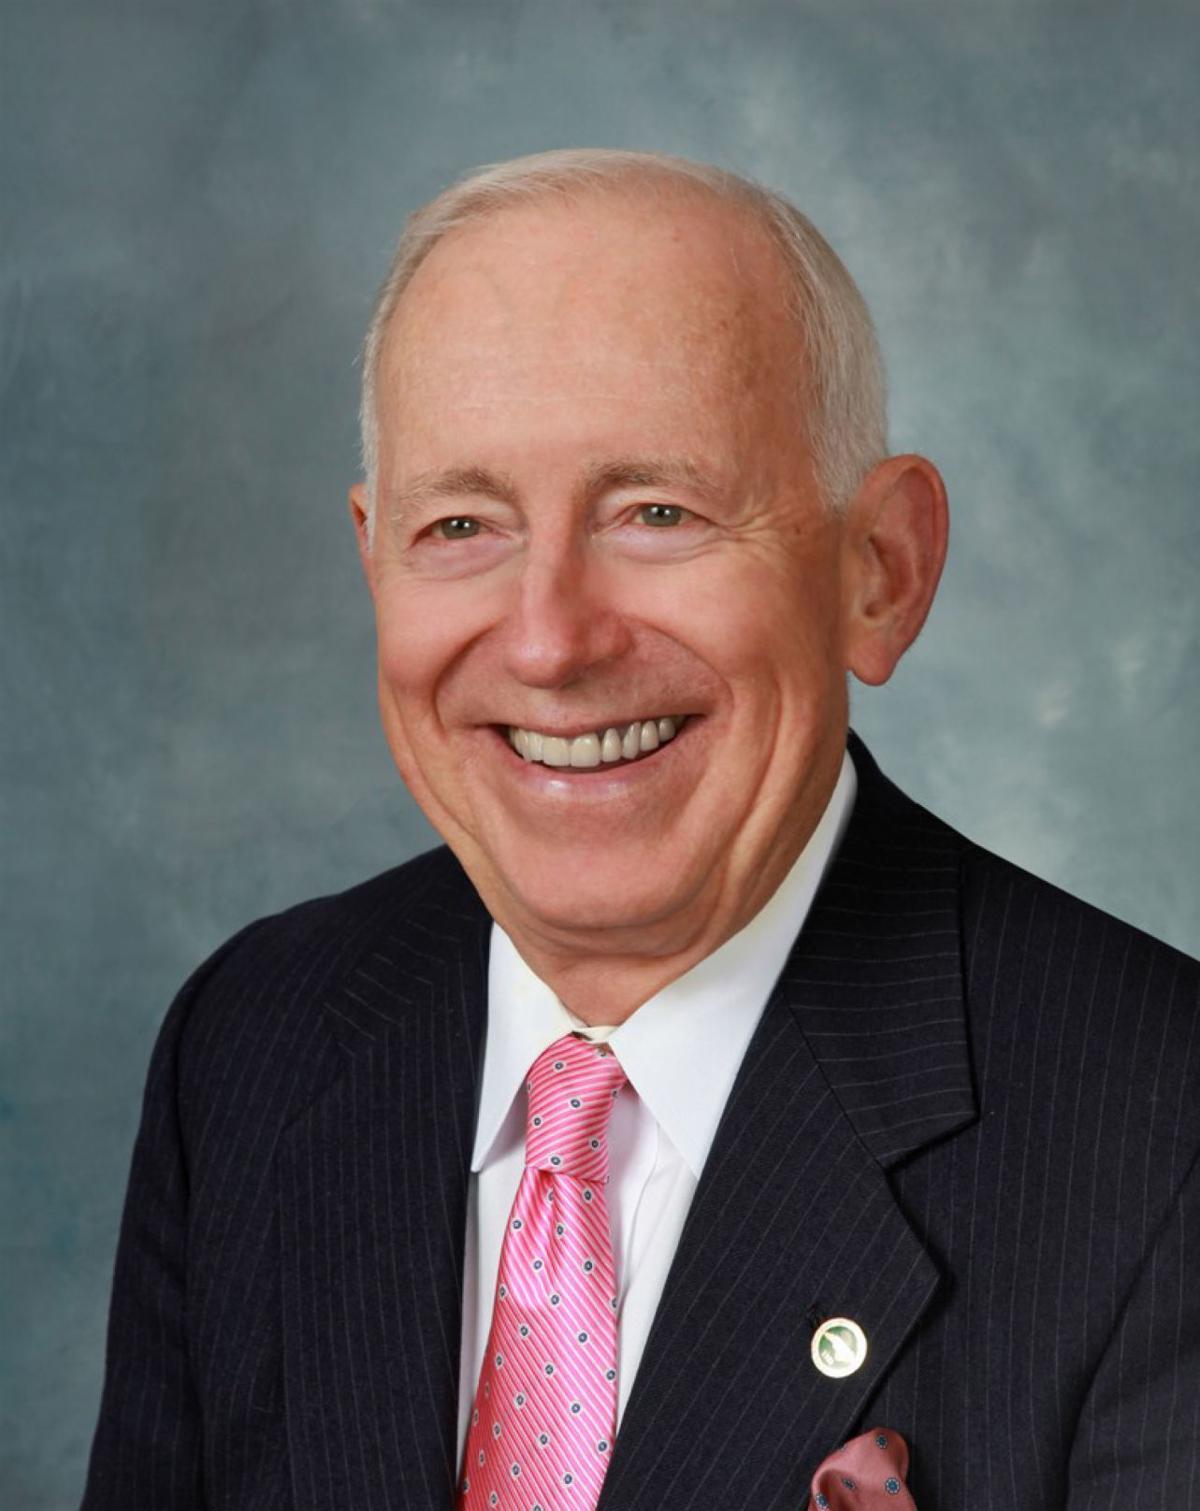 David R. Plyler